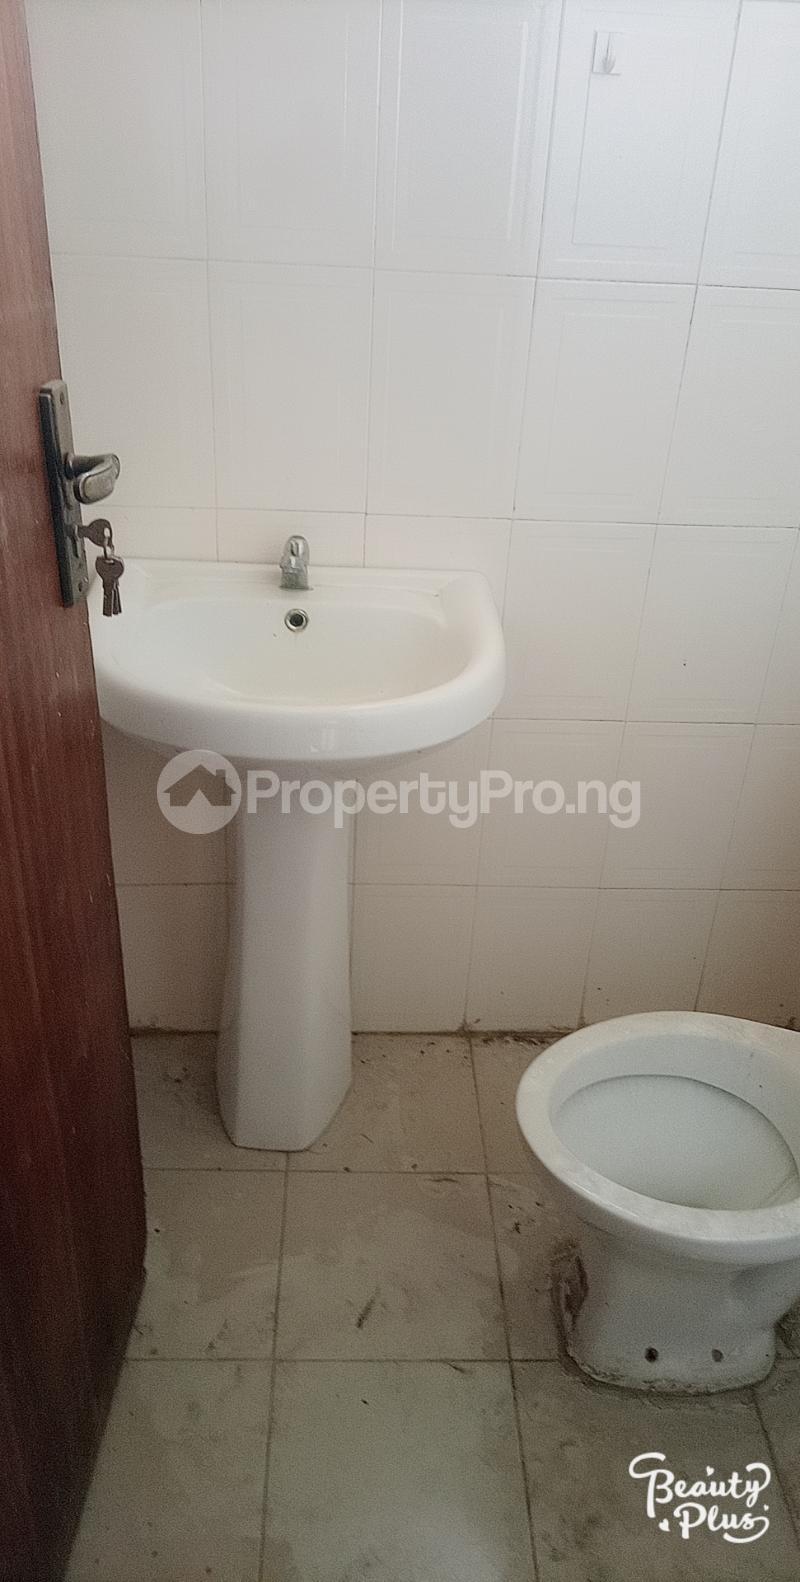 5 bedroom Semi Detached Duplex House for sale Ajao estate Isolo. Lagos Ajao Estate Isolo Lagos - 8